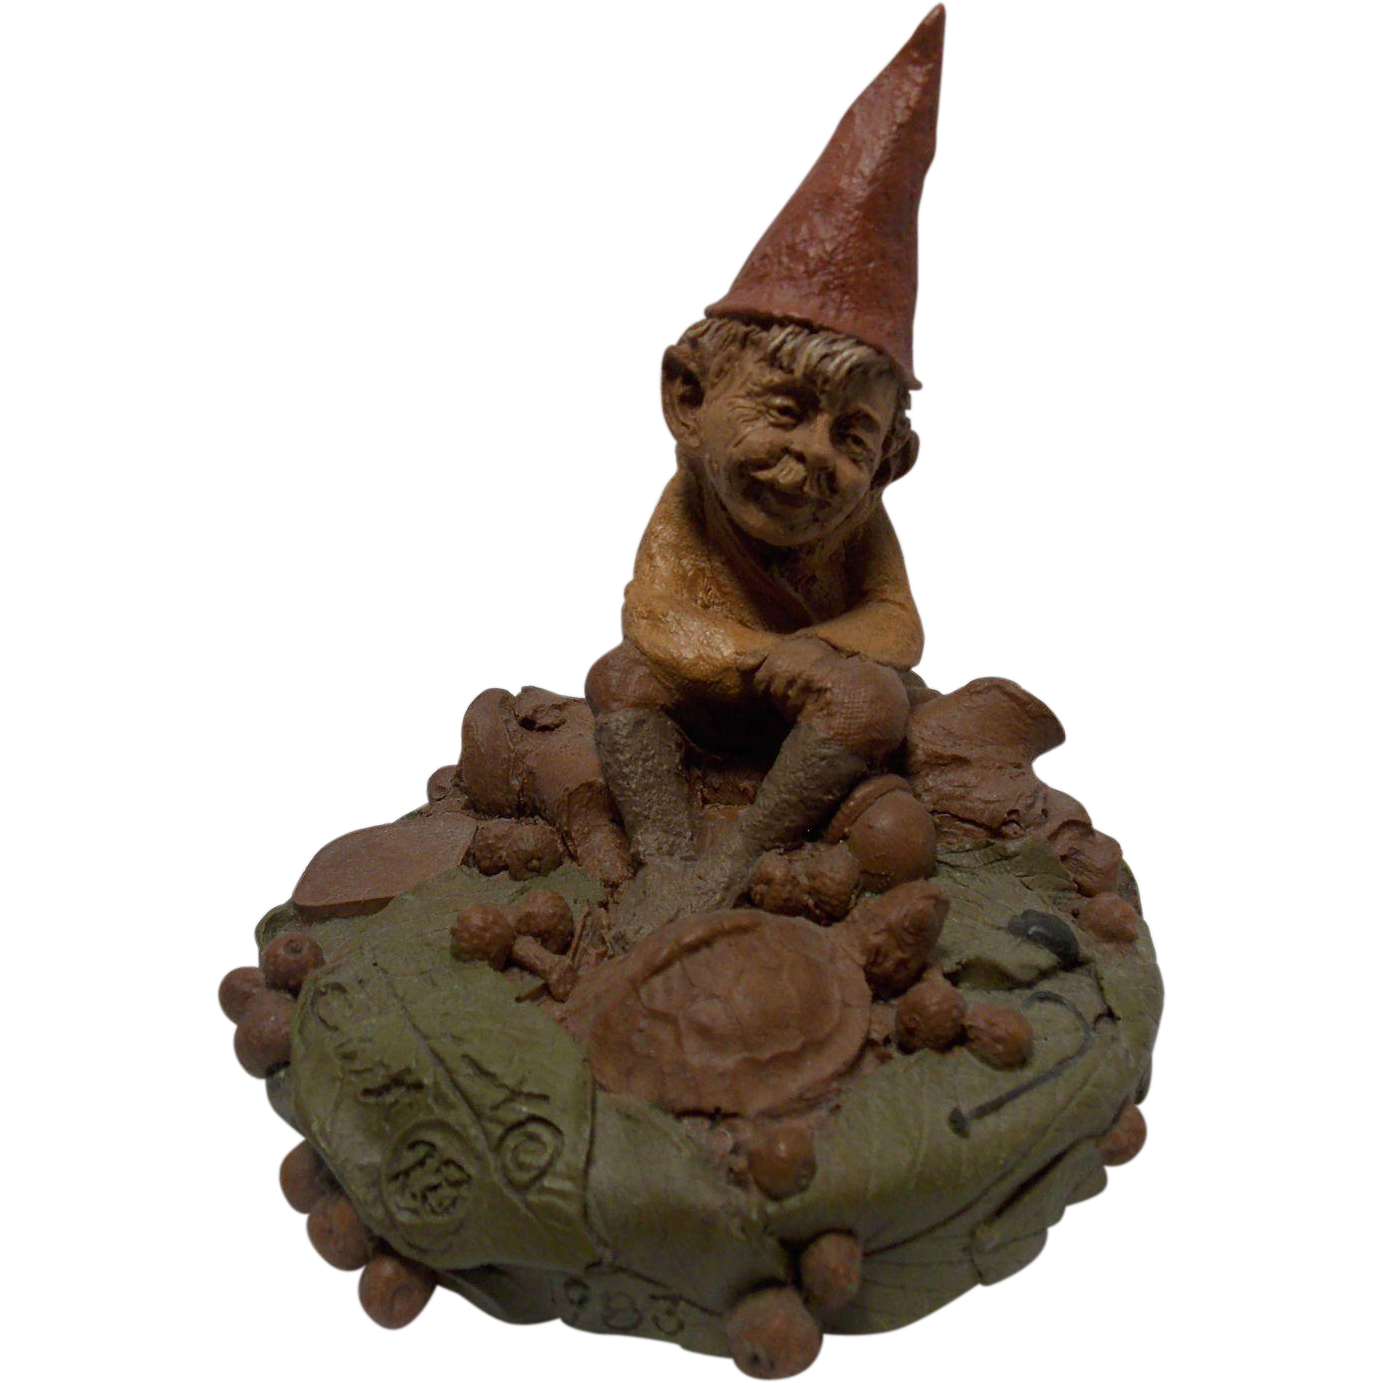 Vintage Tom Clark Gnome (Retired) Freddy, the Freshwater Fisherman